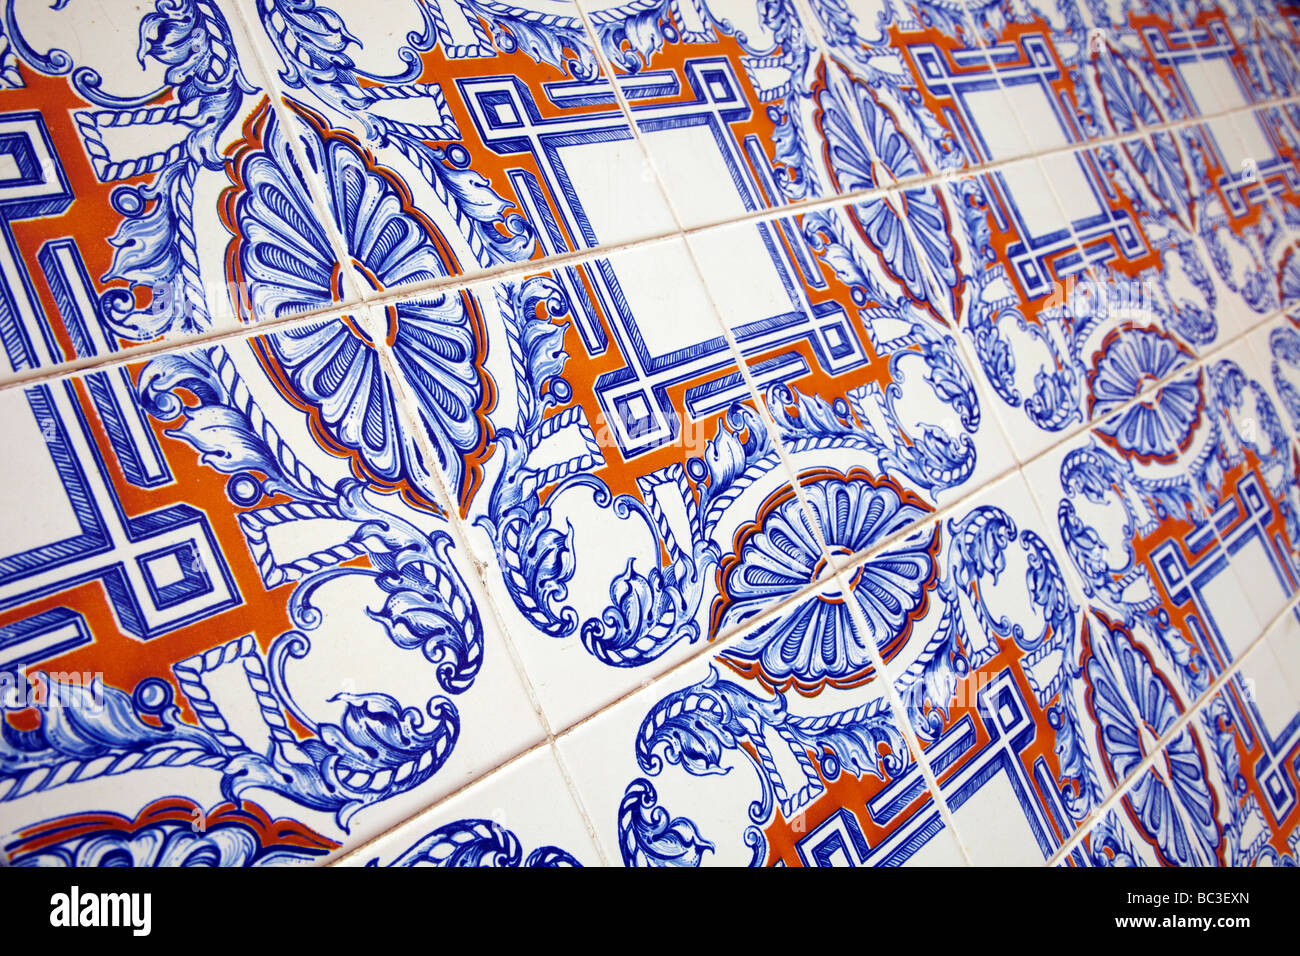 colored wall tiles, Lisbon, Portugal - Stock Image